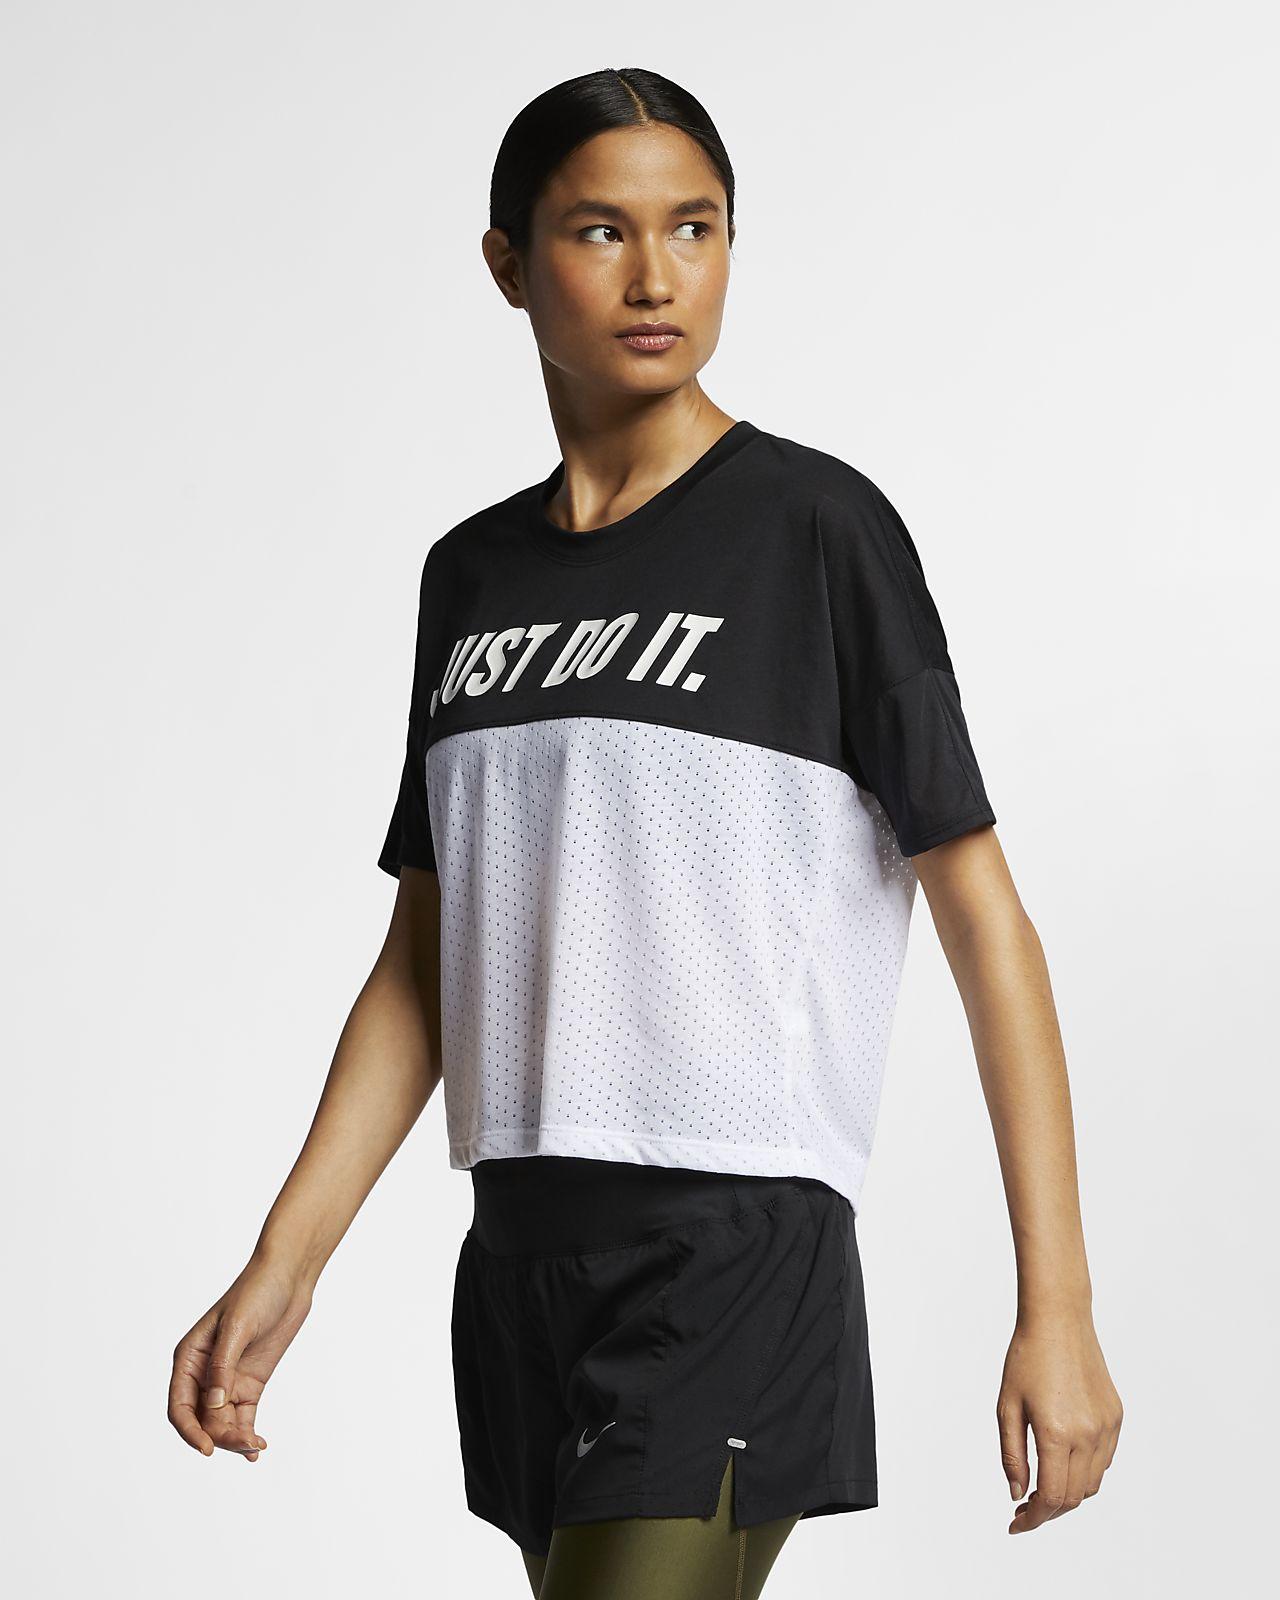 e1630da387b8 Haut de running à manches courtes Nike Tailwind pour Femme. Nike.com FR